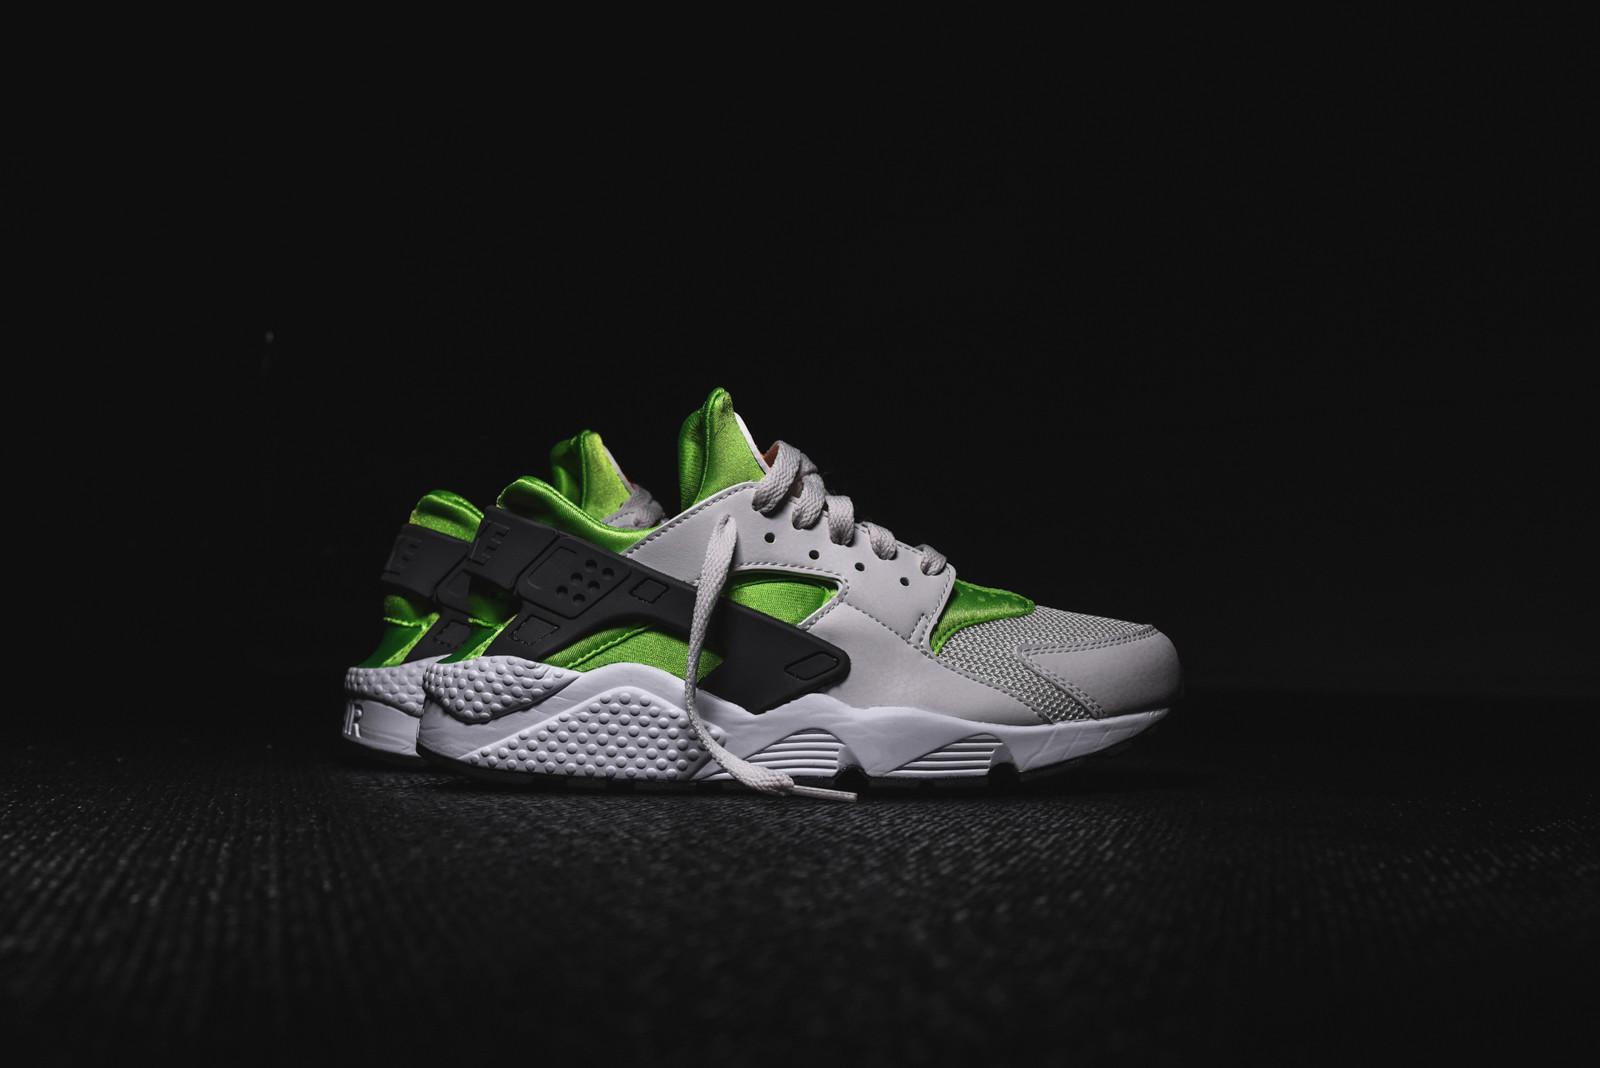 bfe3f7138dc Very Goods   Nike Air Huarache Run - Action Green   Kith NYC